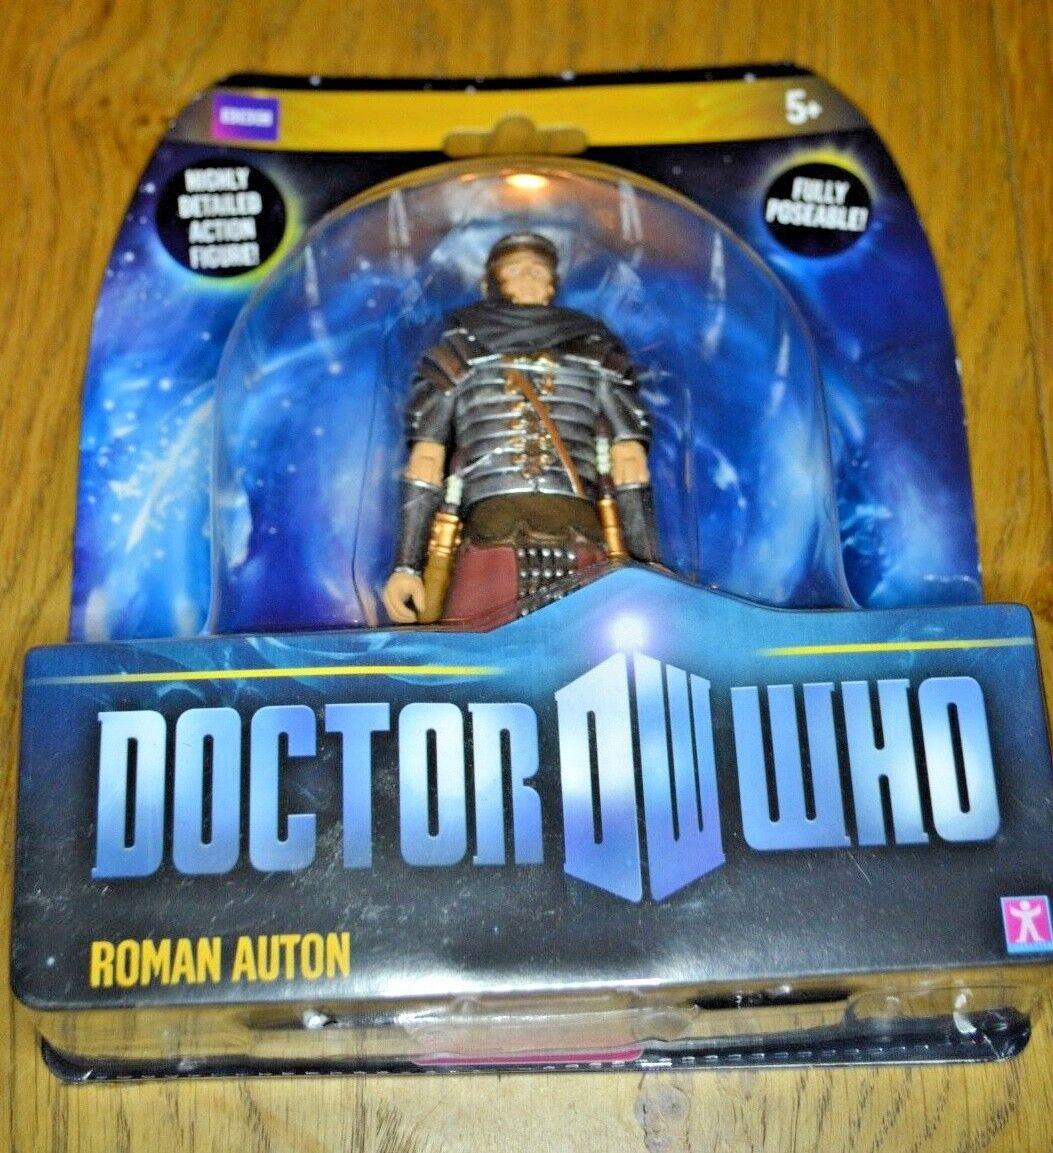 Modern Vintage Dr Who Action Action Action Figure Roman Auton; Factory Sealed 323d03